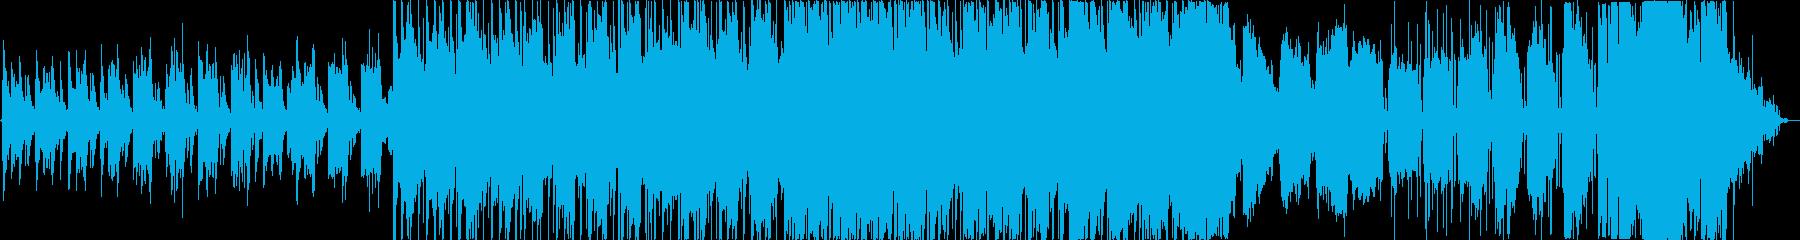 Bluemoon Bluesの再生済みの波形